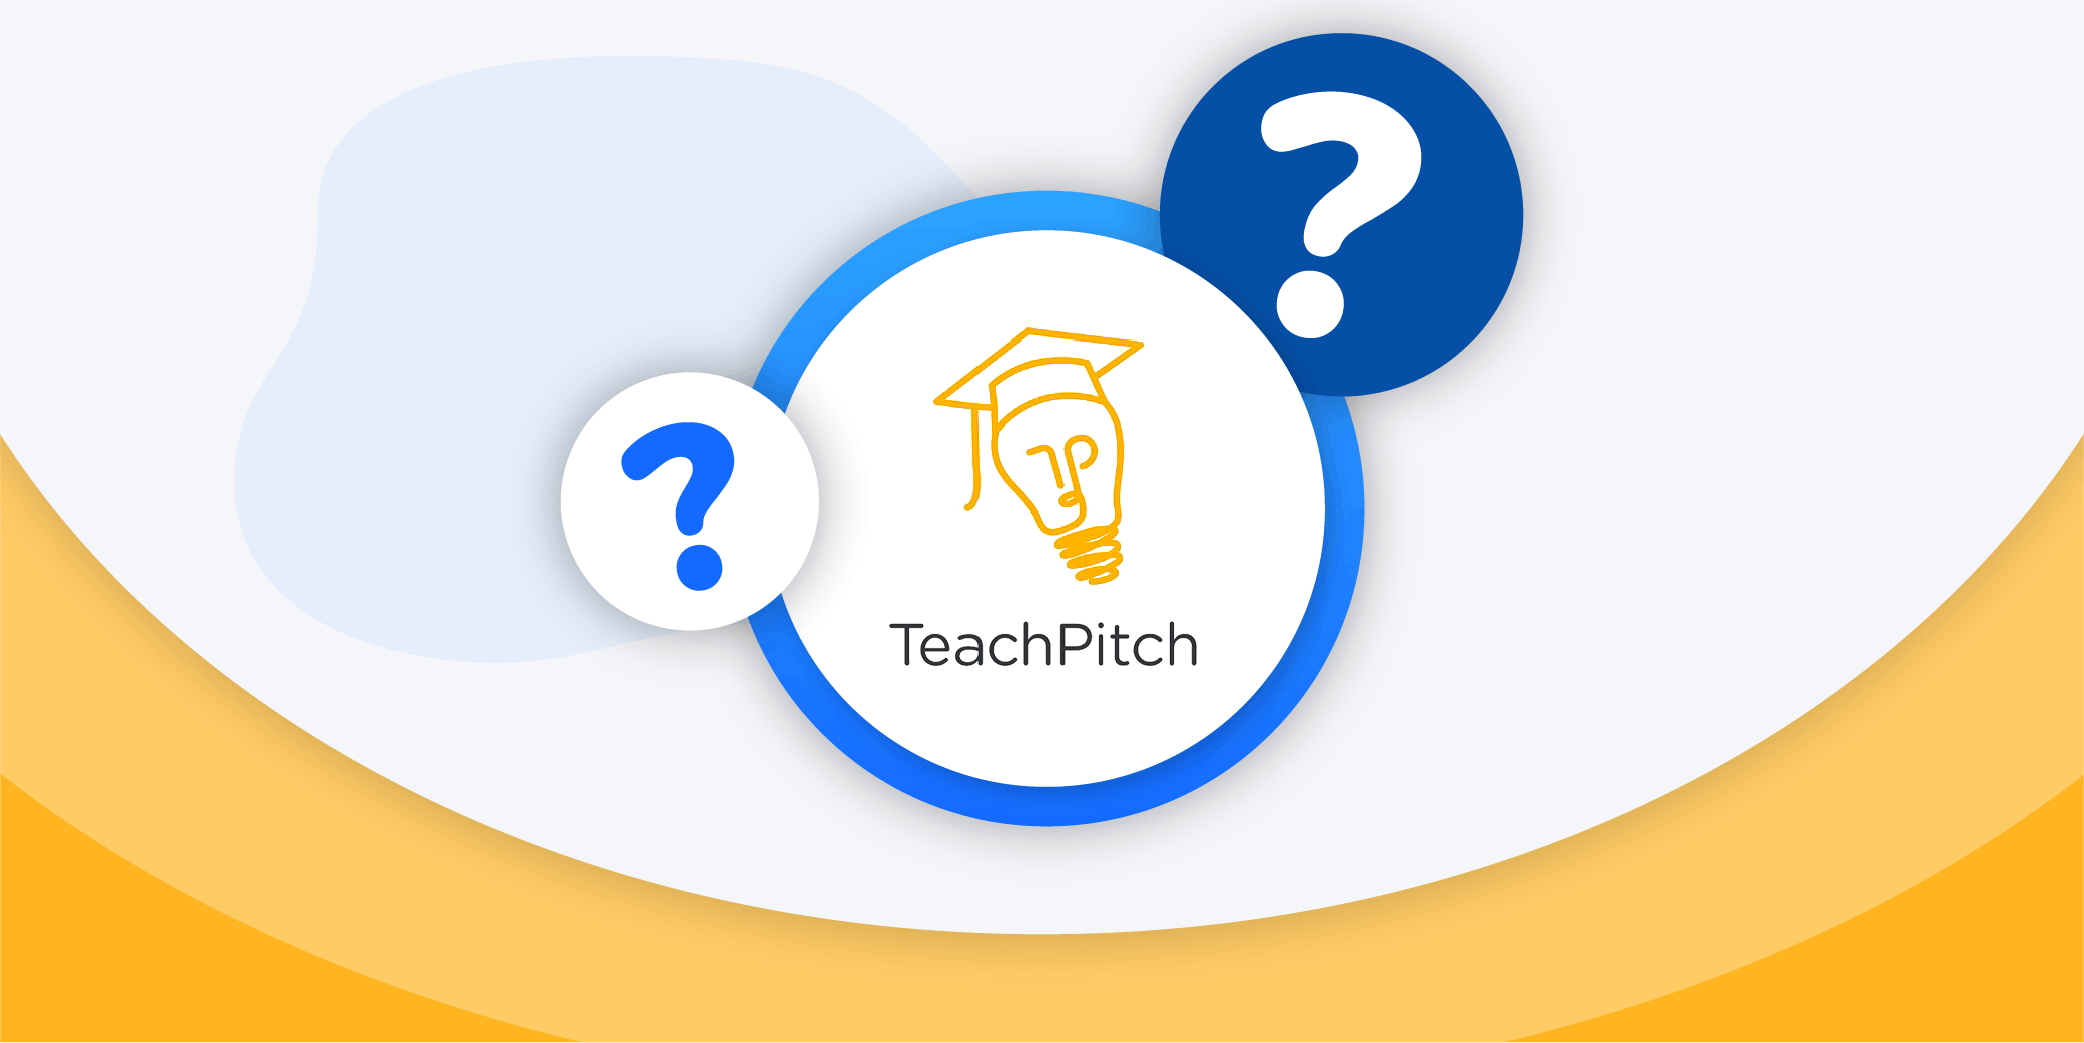 TeachPitch, learn more & teach better